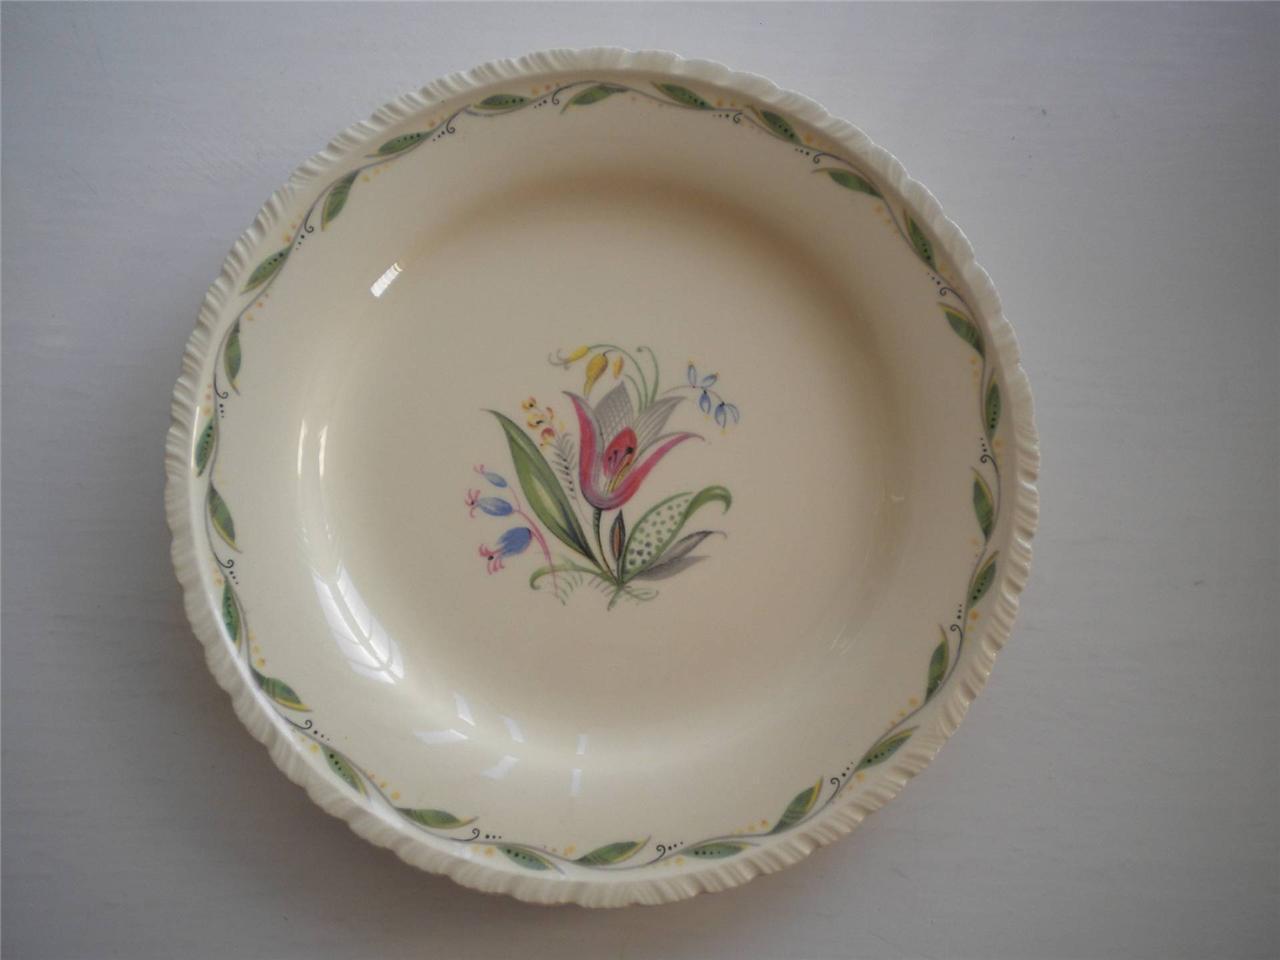 New Hall Porcelain